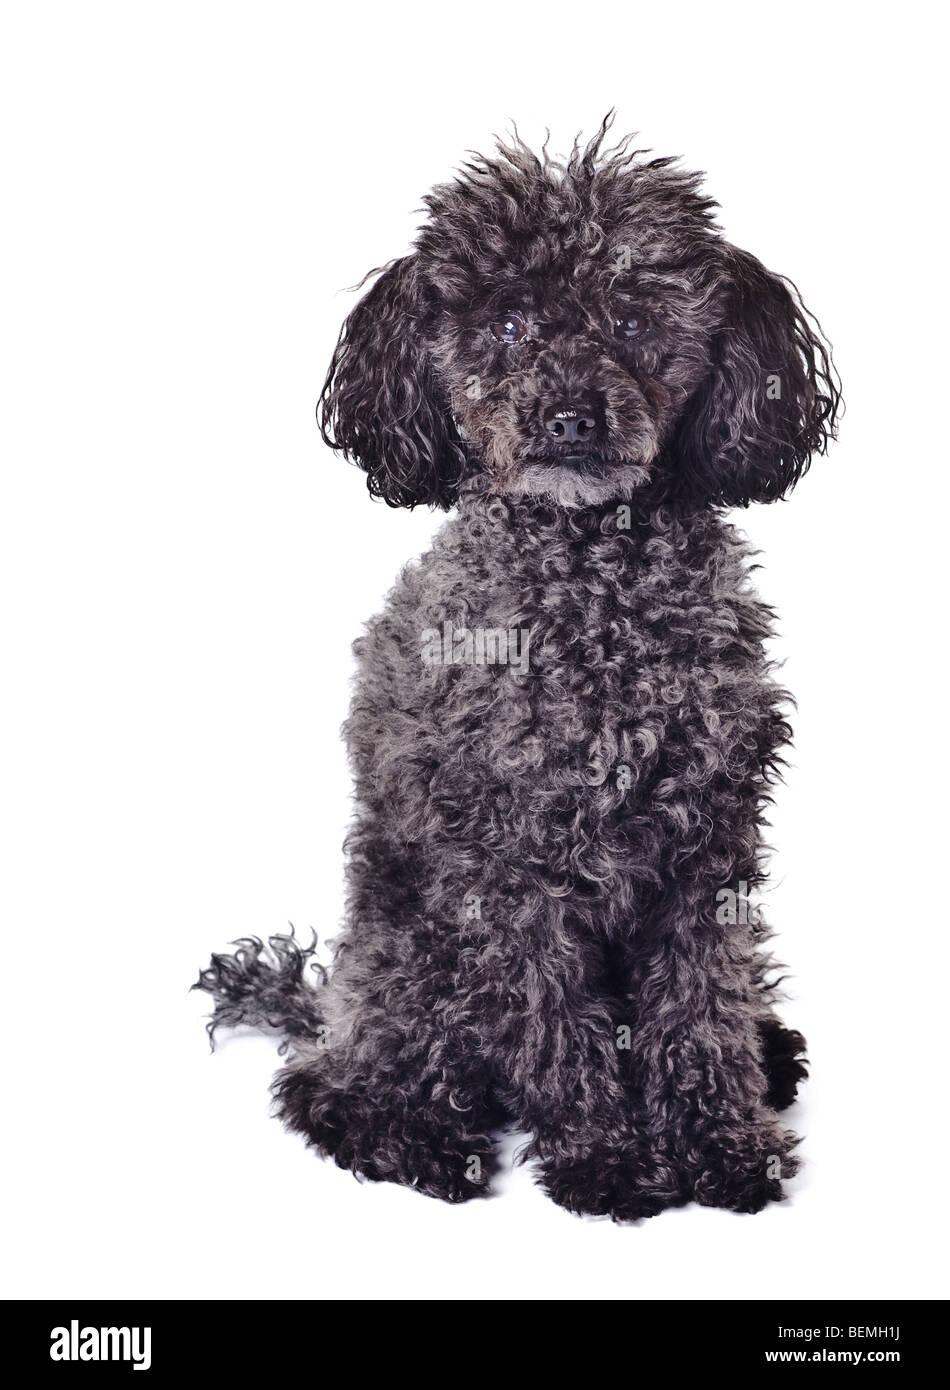 black poodle isolated on a white background - Stock Image